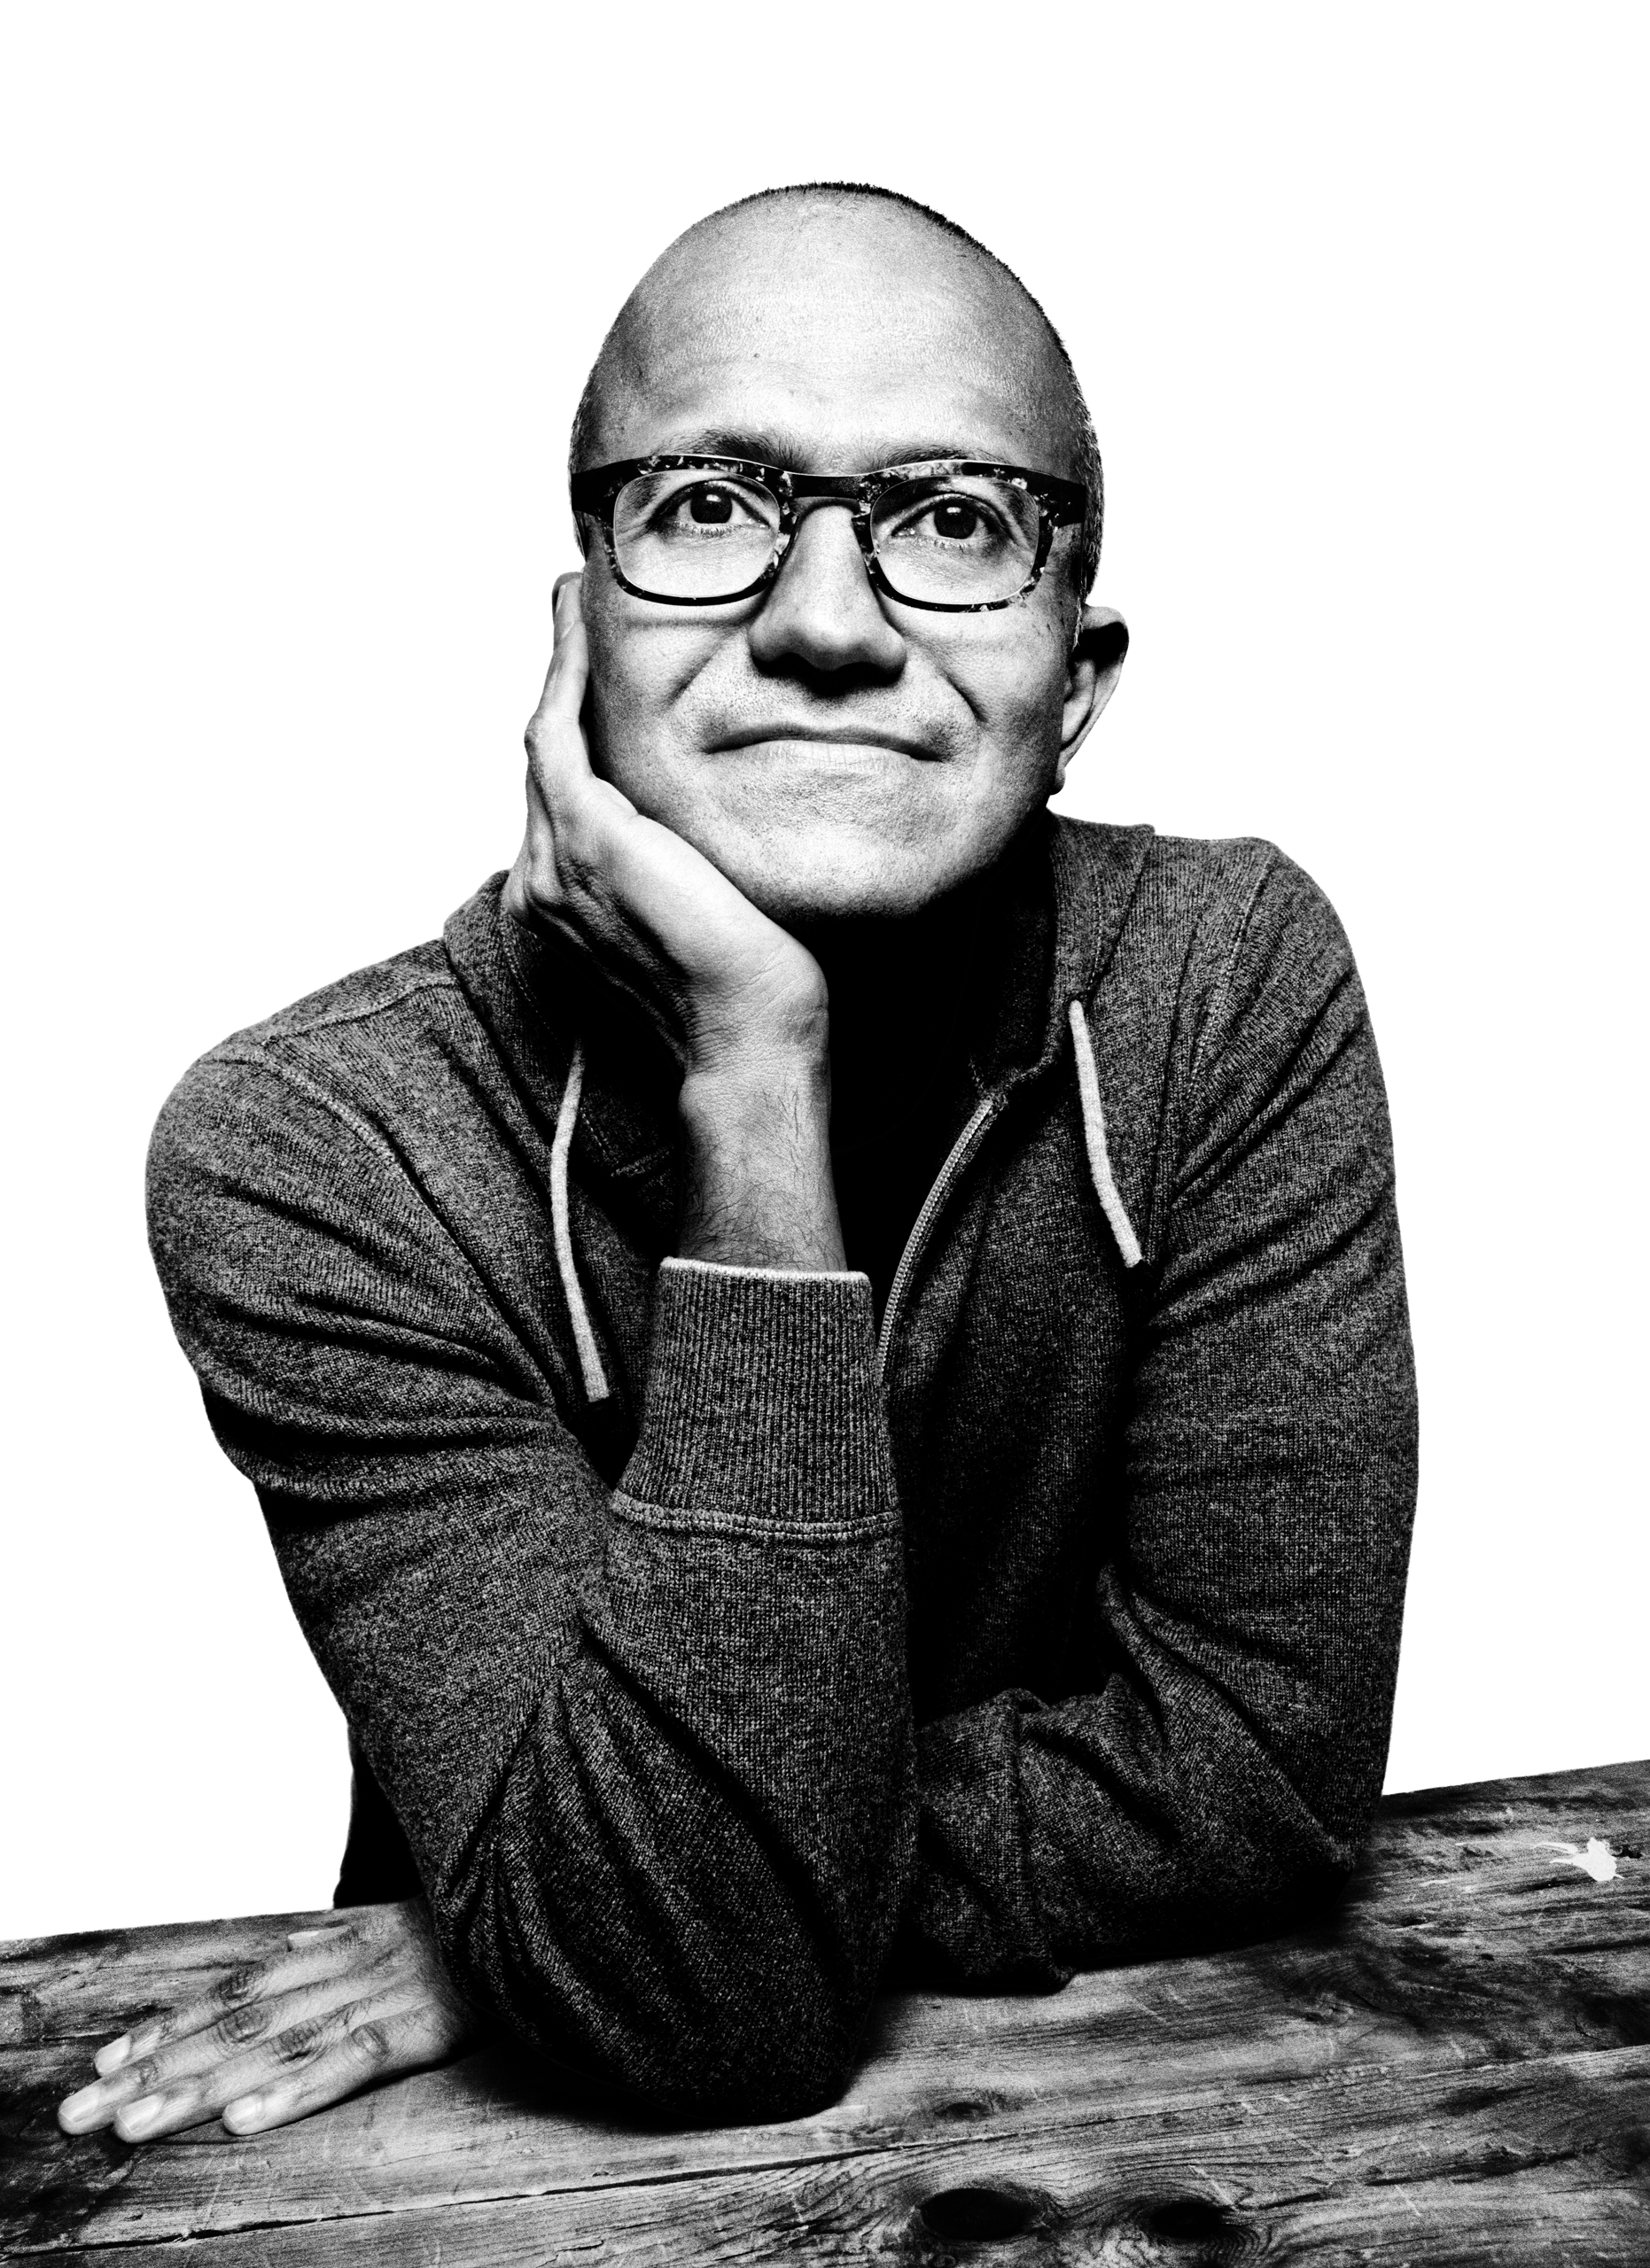 Microsofts Satya Nadella flips the script